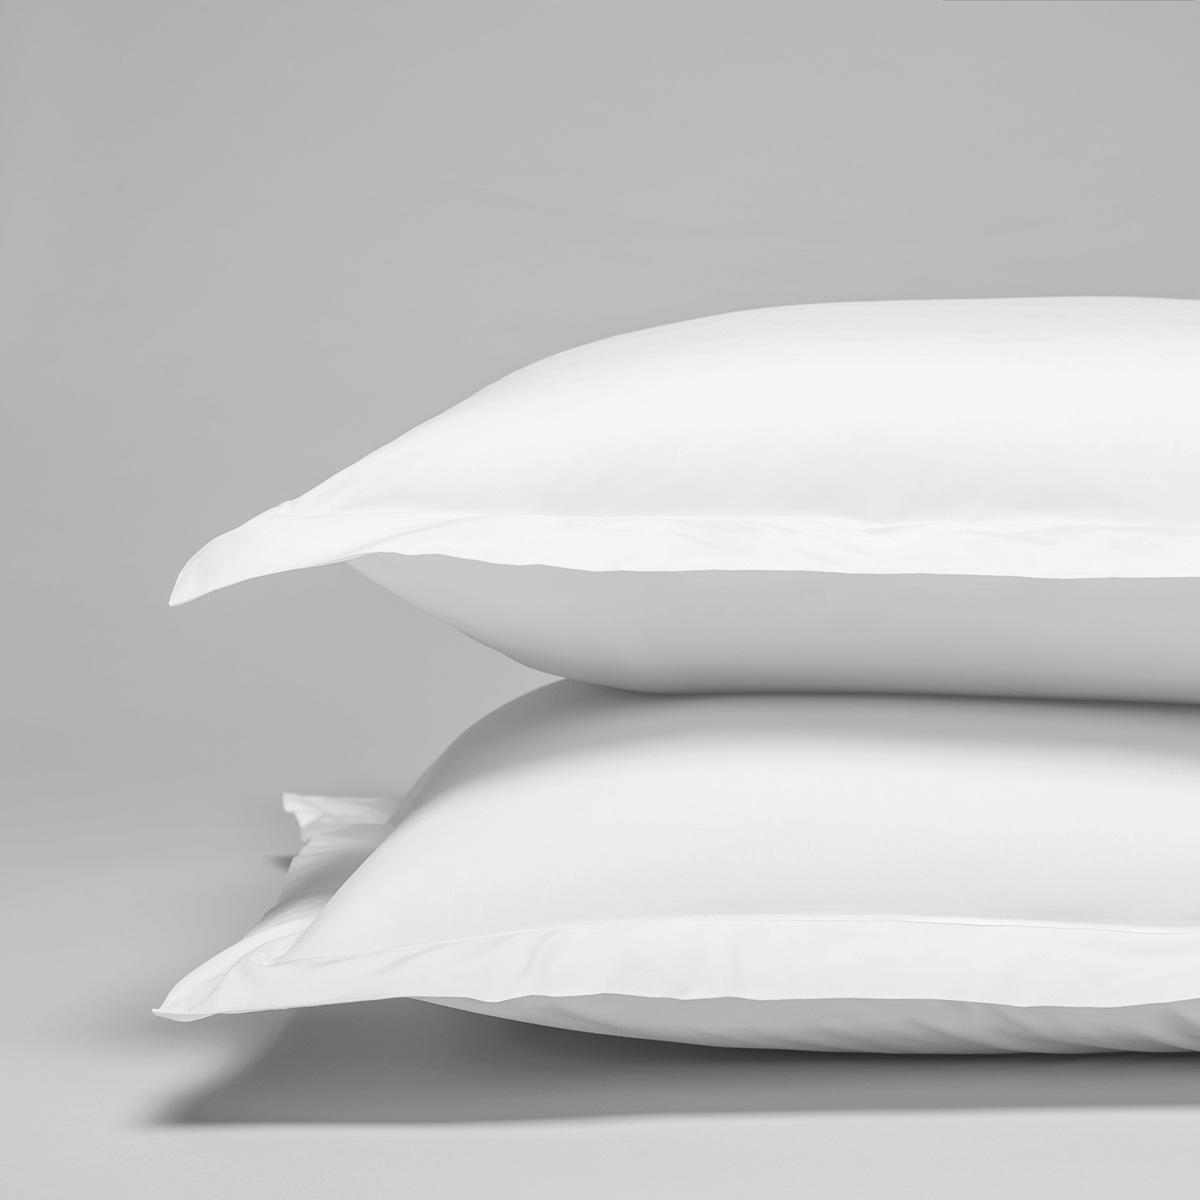 Taie d'oreiller percale de coton peigné 160 fils 65x65